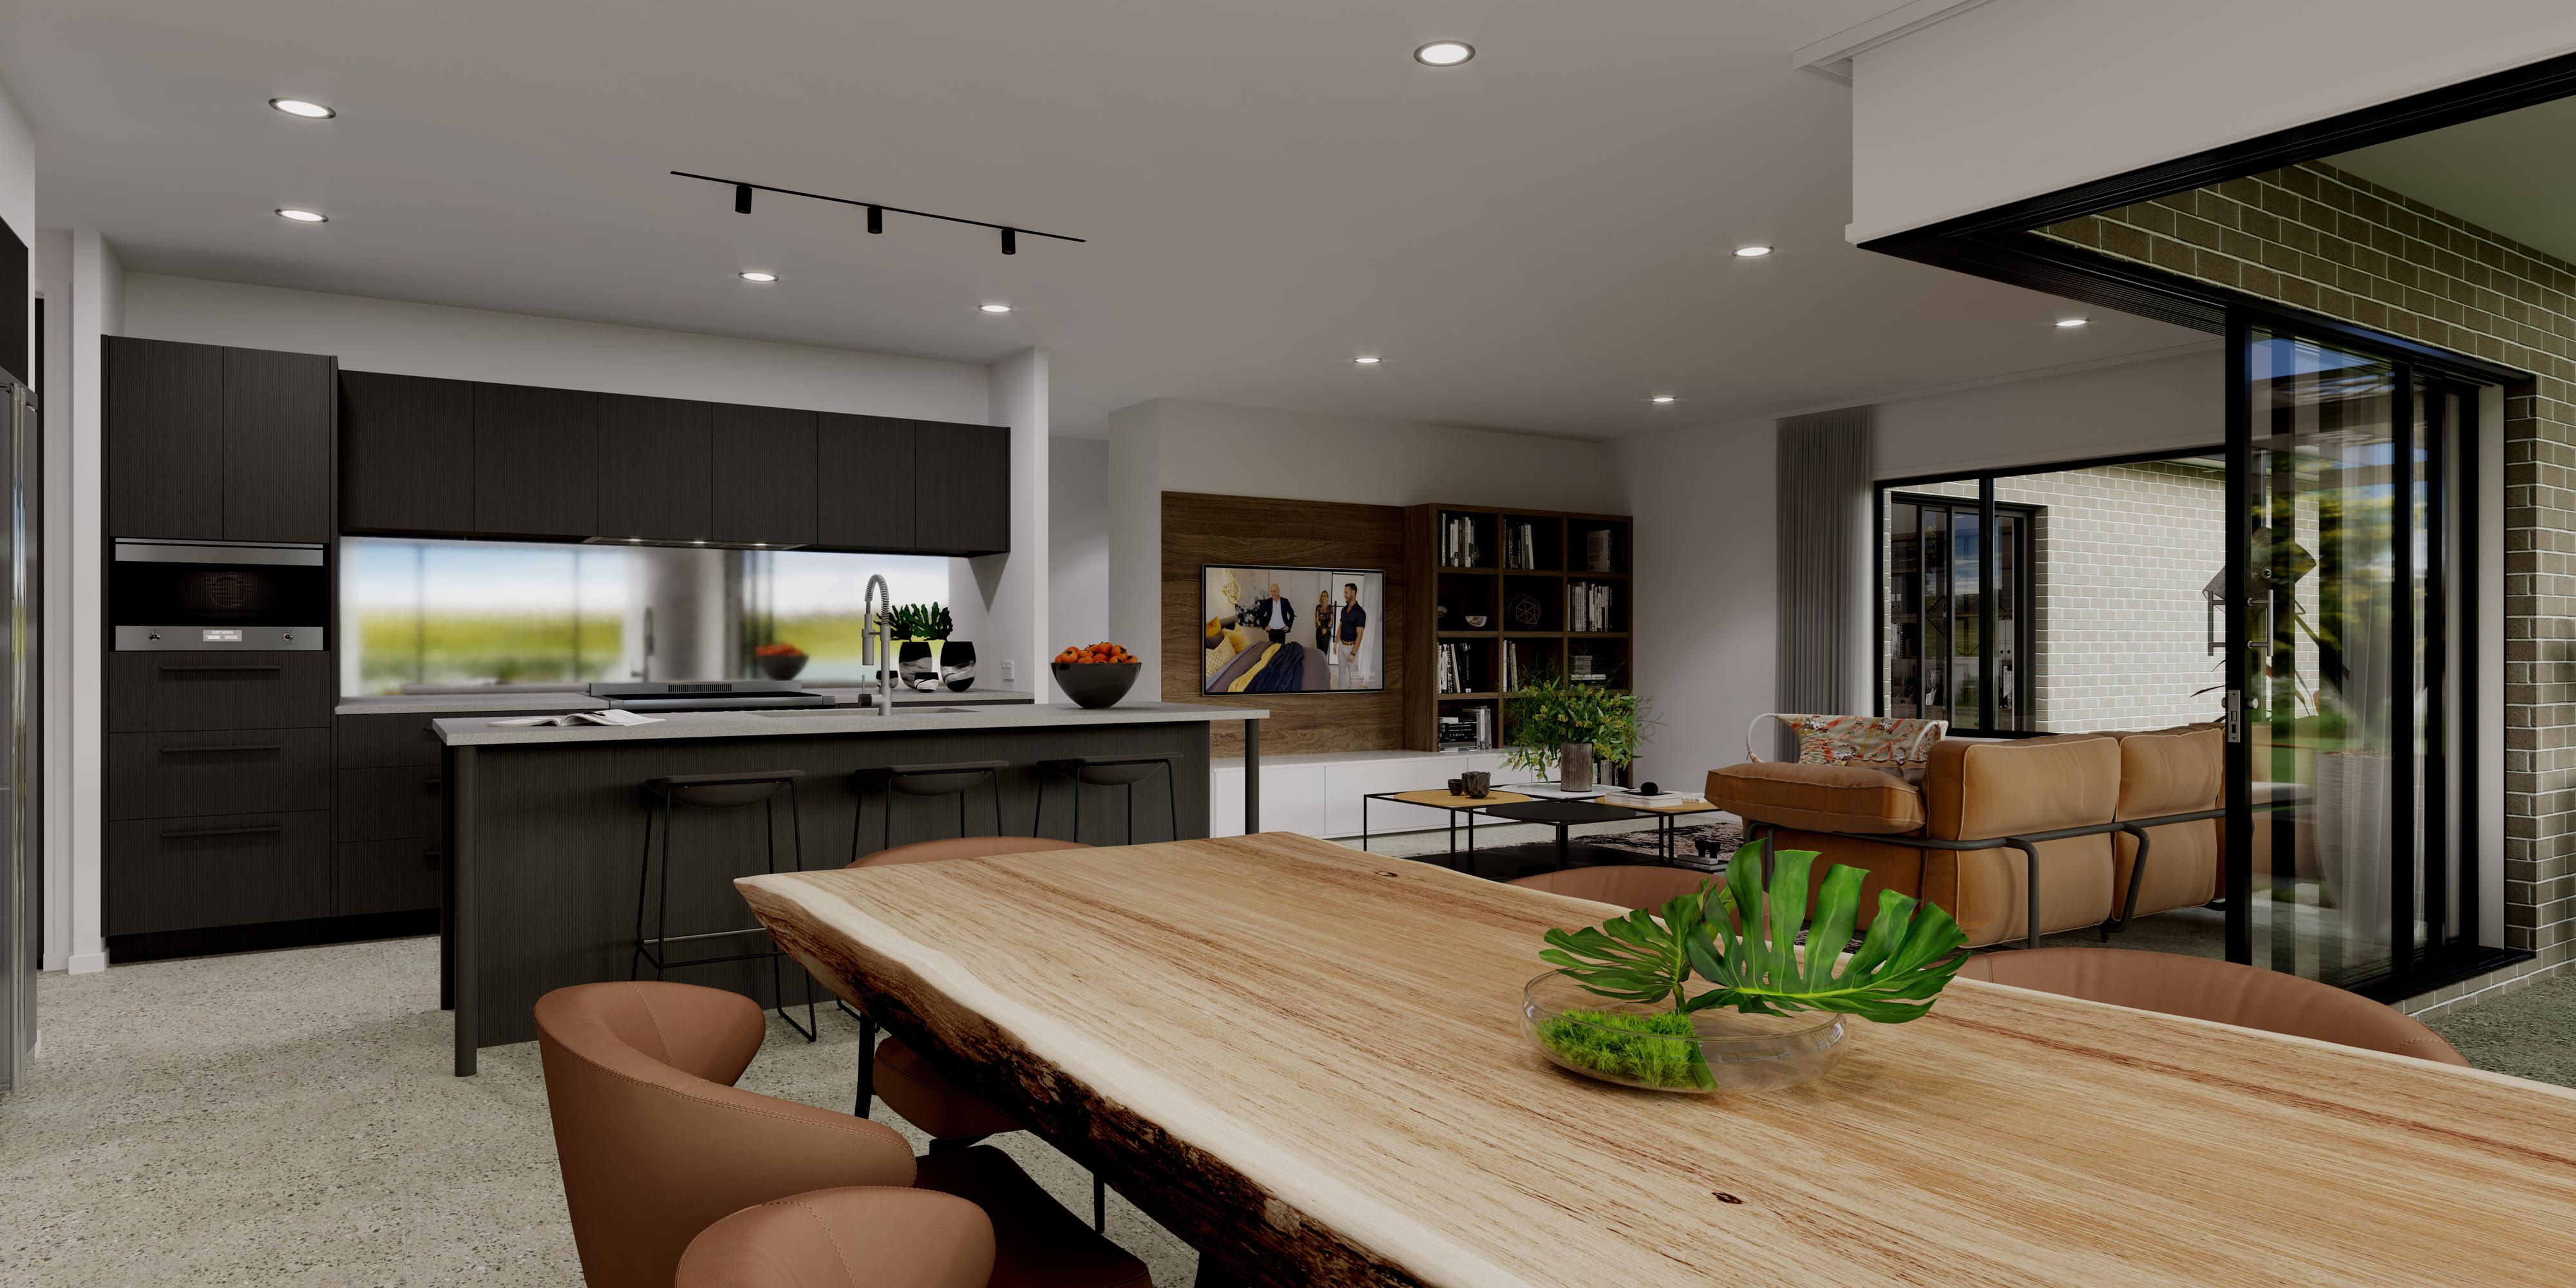 Darren-Plamer-Coolum-268-Urban-Urb_Dining Palmer Home Imagers Ociated Designs on